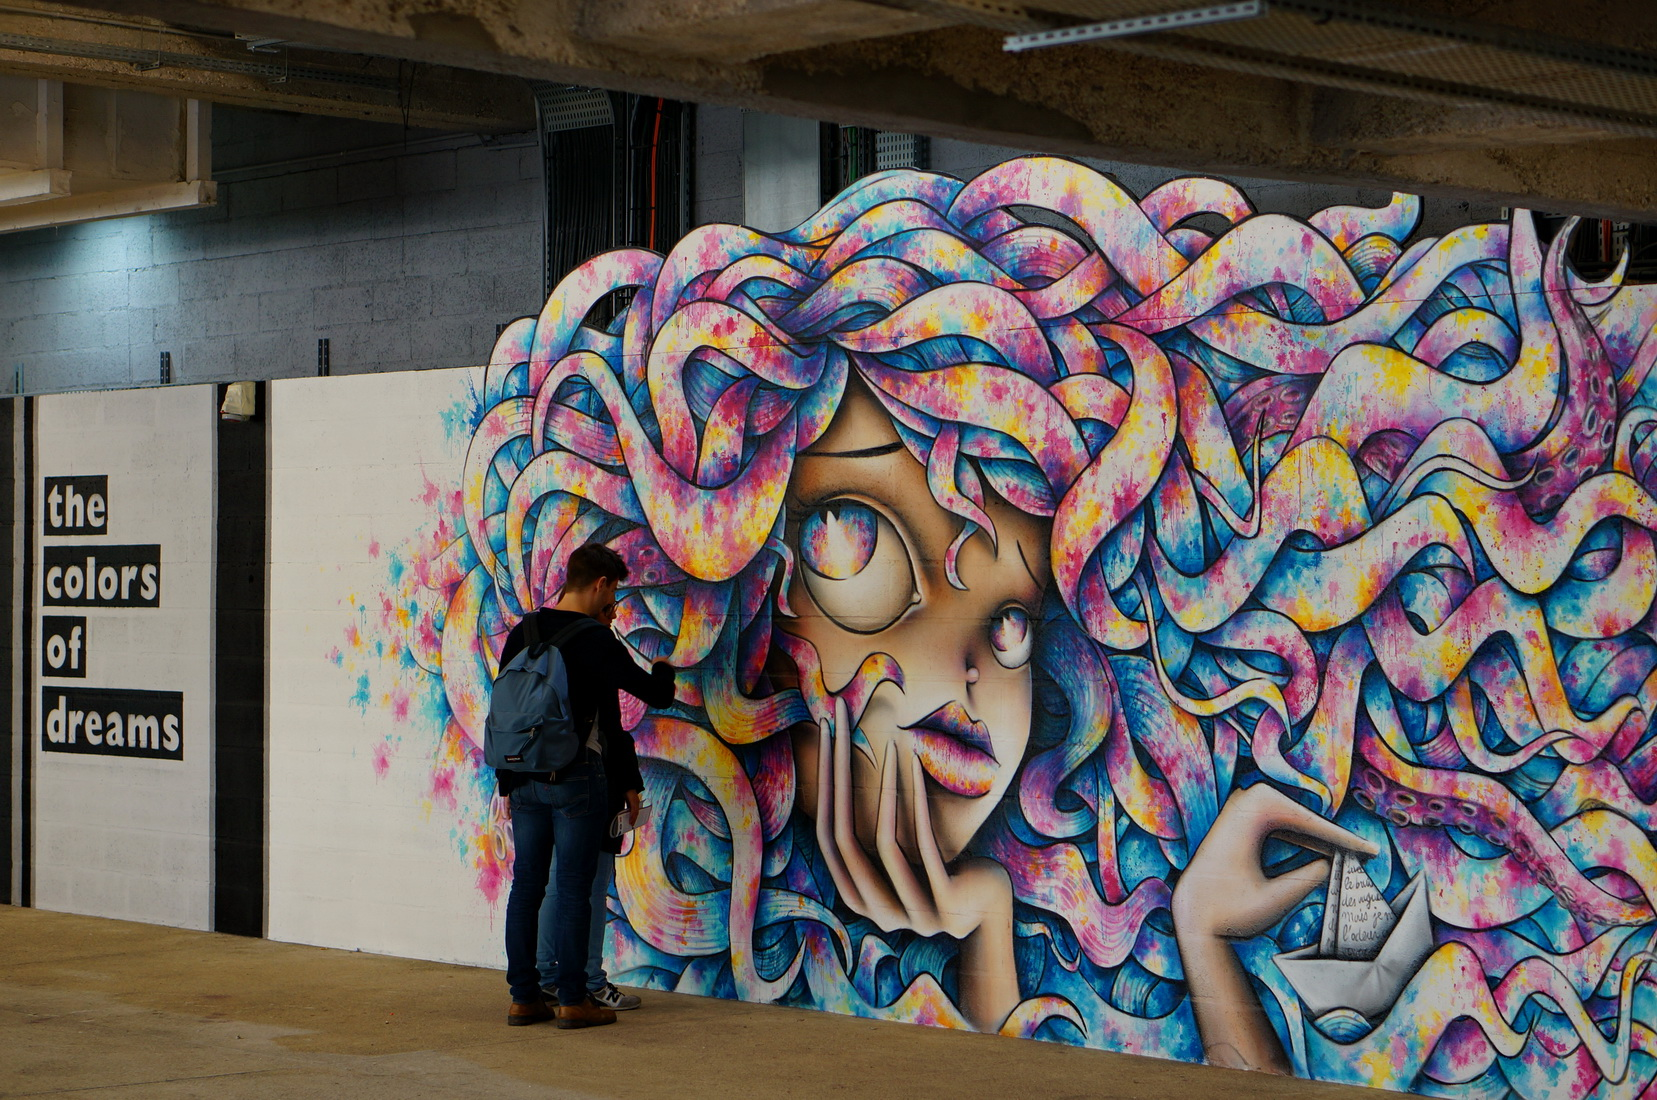 wanderlust, street art, street art paris, paris 13, art urbain paris